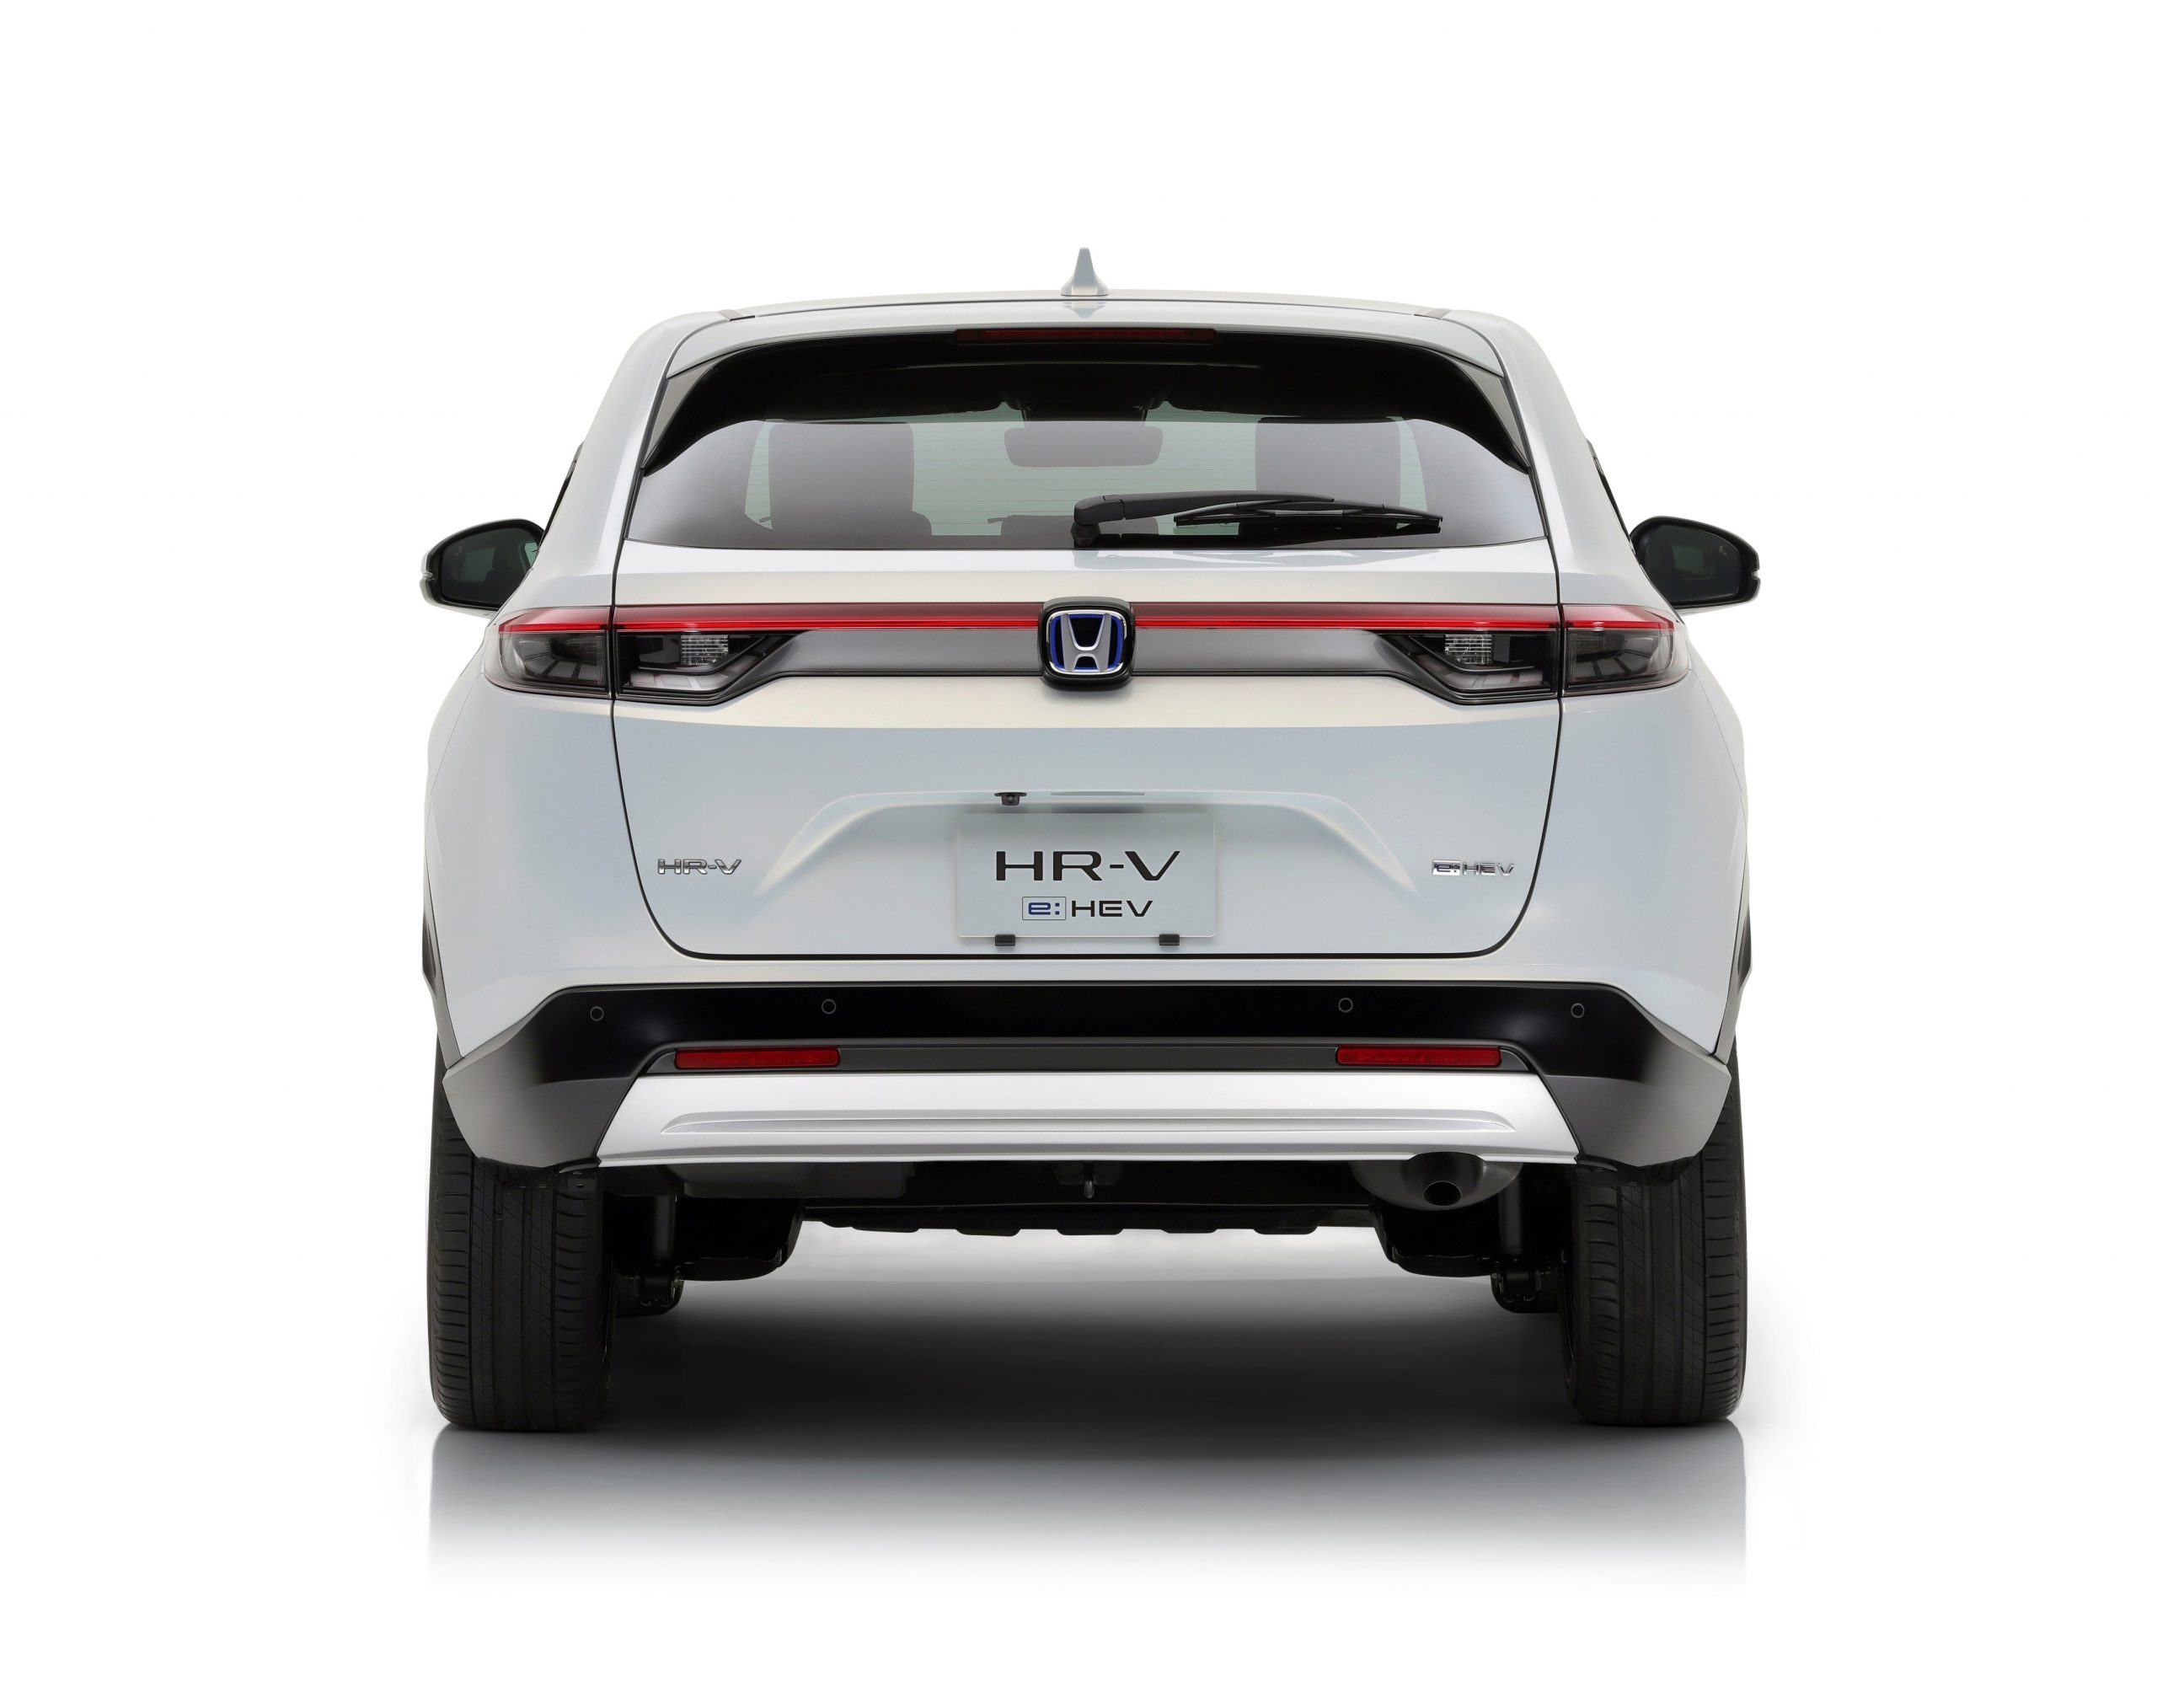 329178 Honda HR V E HEV 2021 Scaled